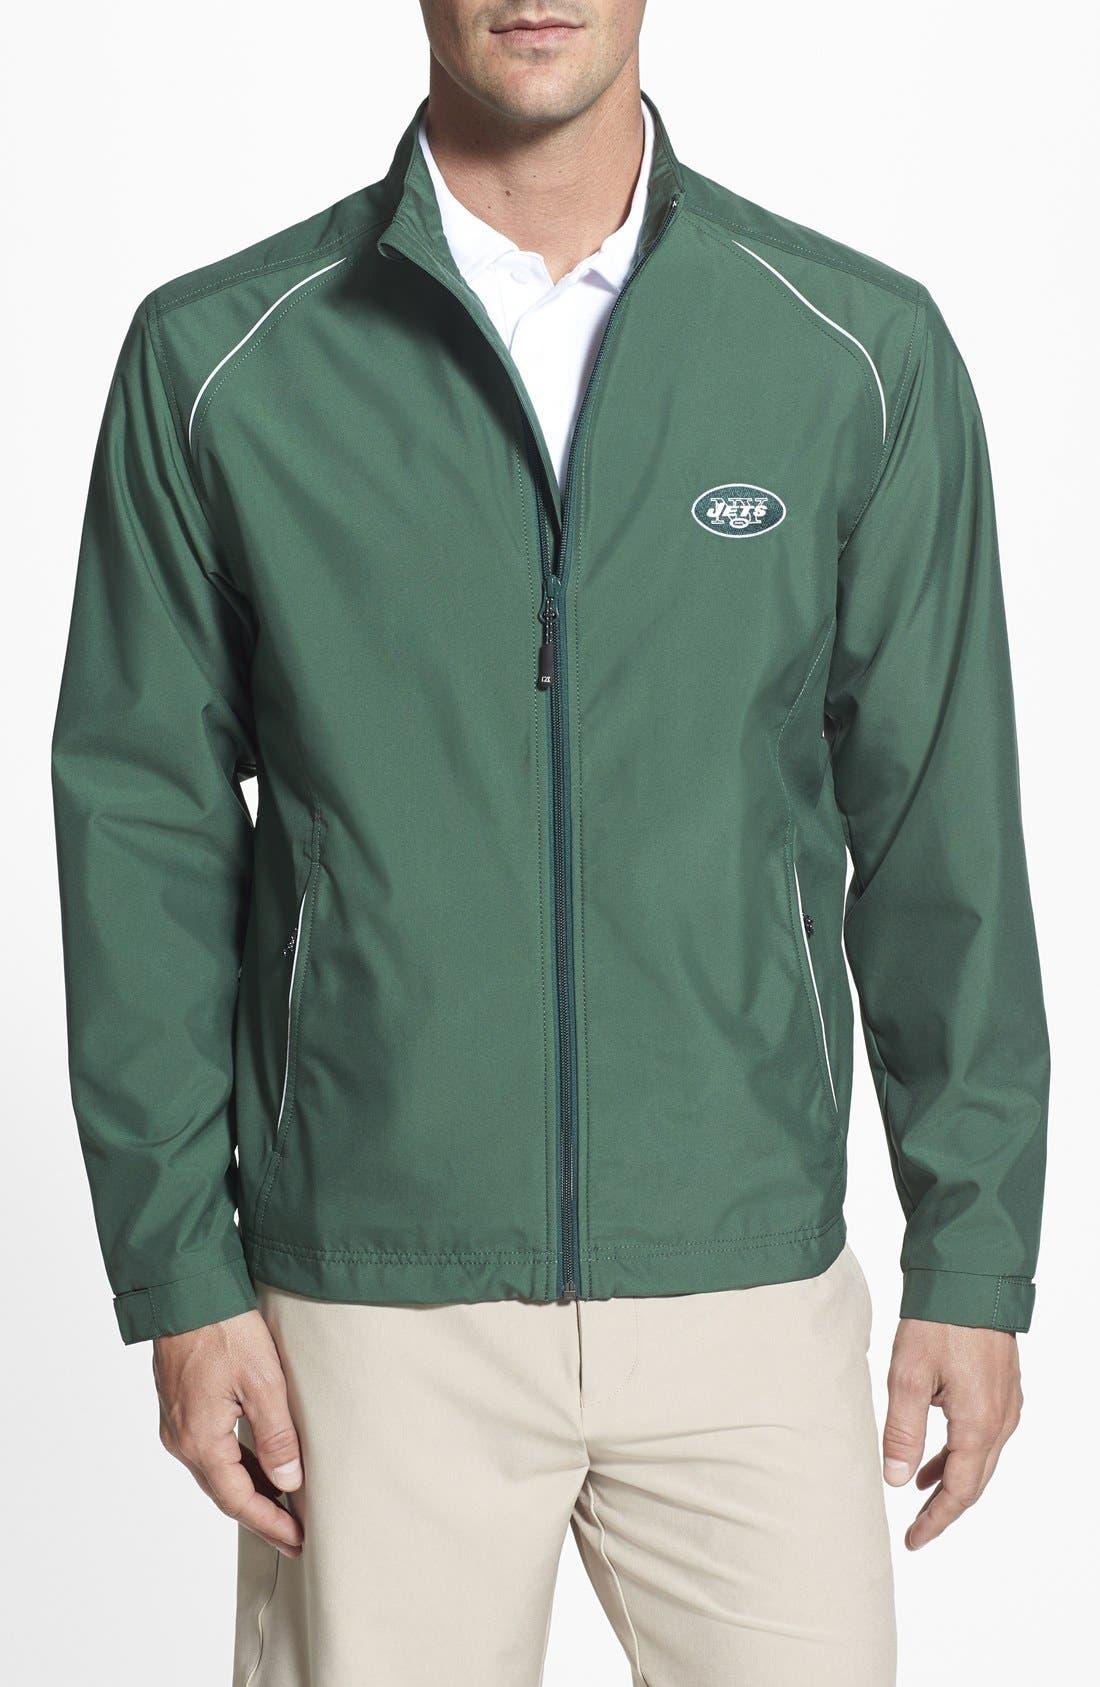 Main Image - Cutter & Buck New York Jets - Beacon WeatherTec Wind & Water Resistant Jacket